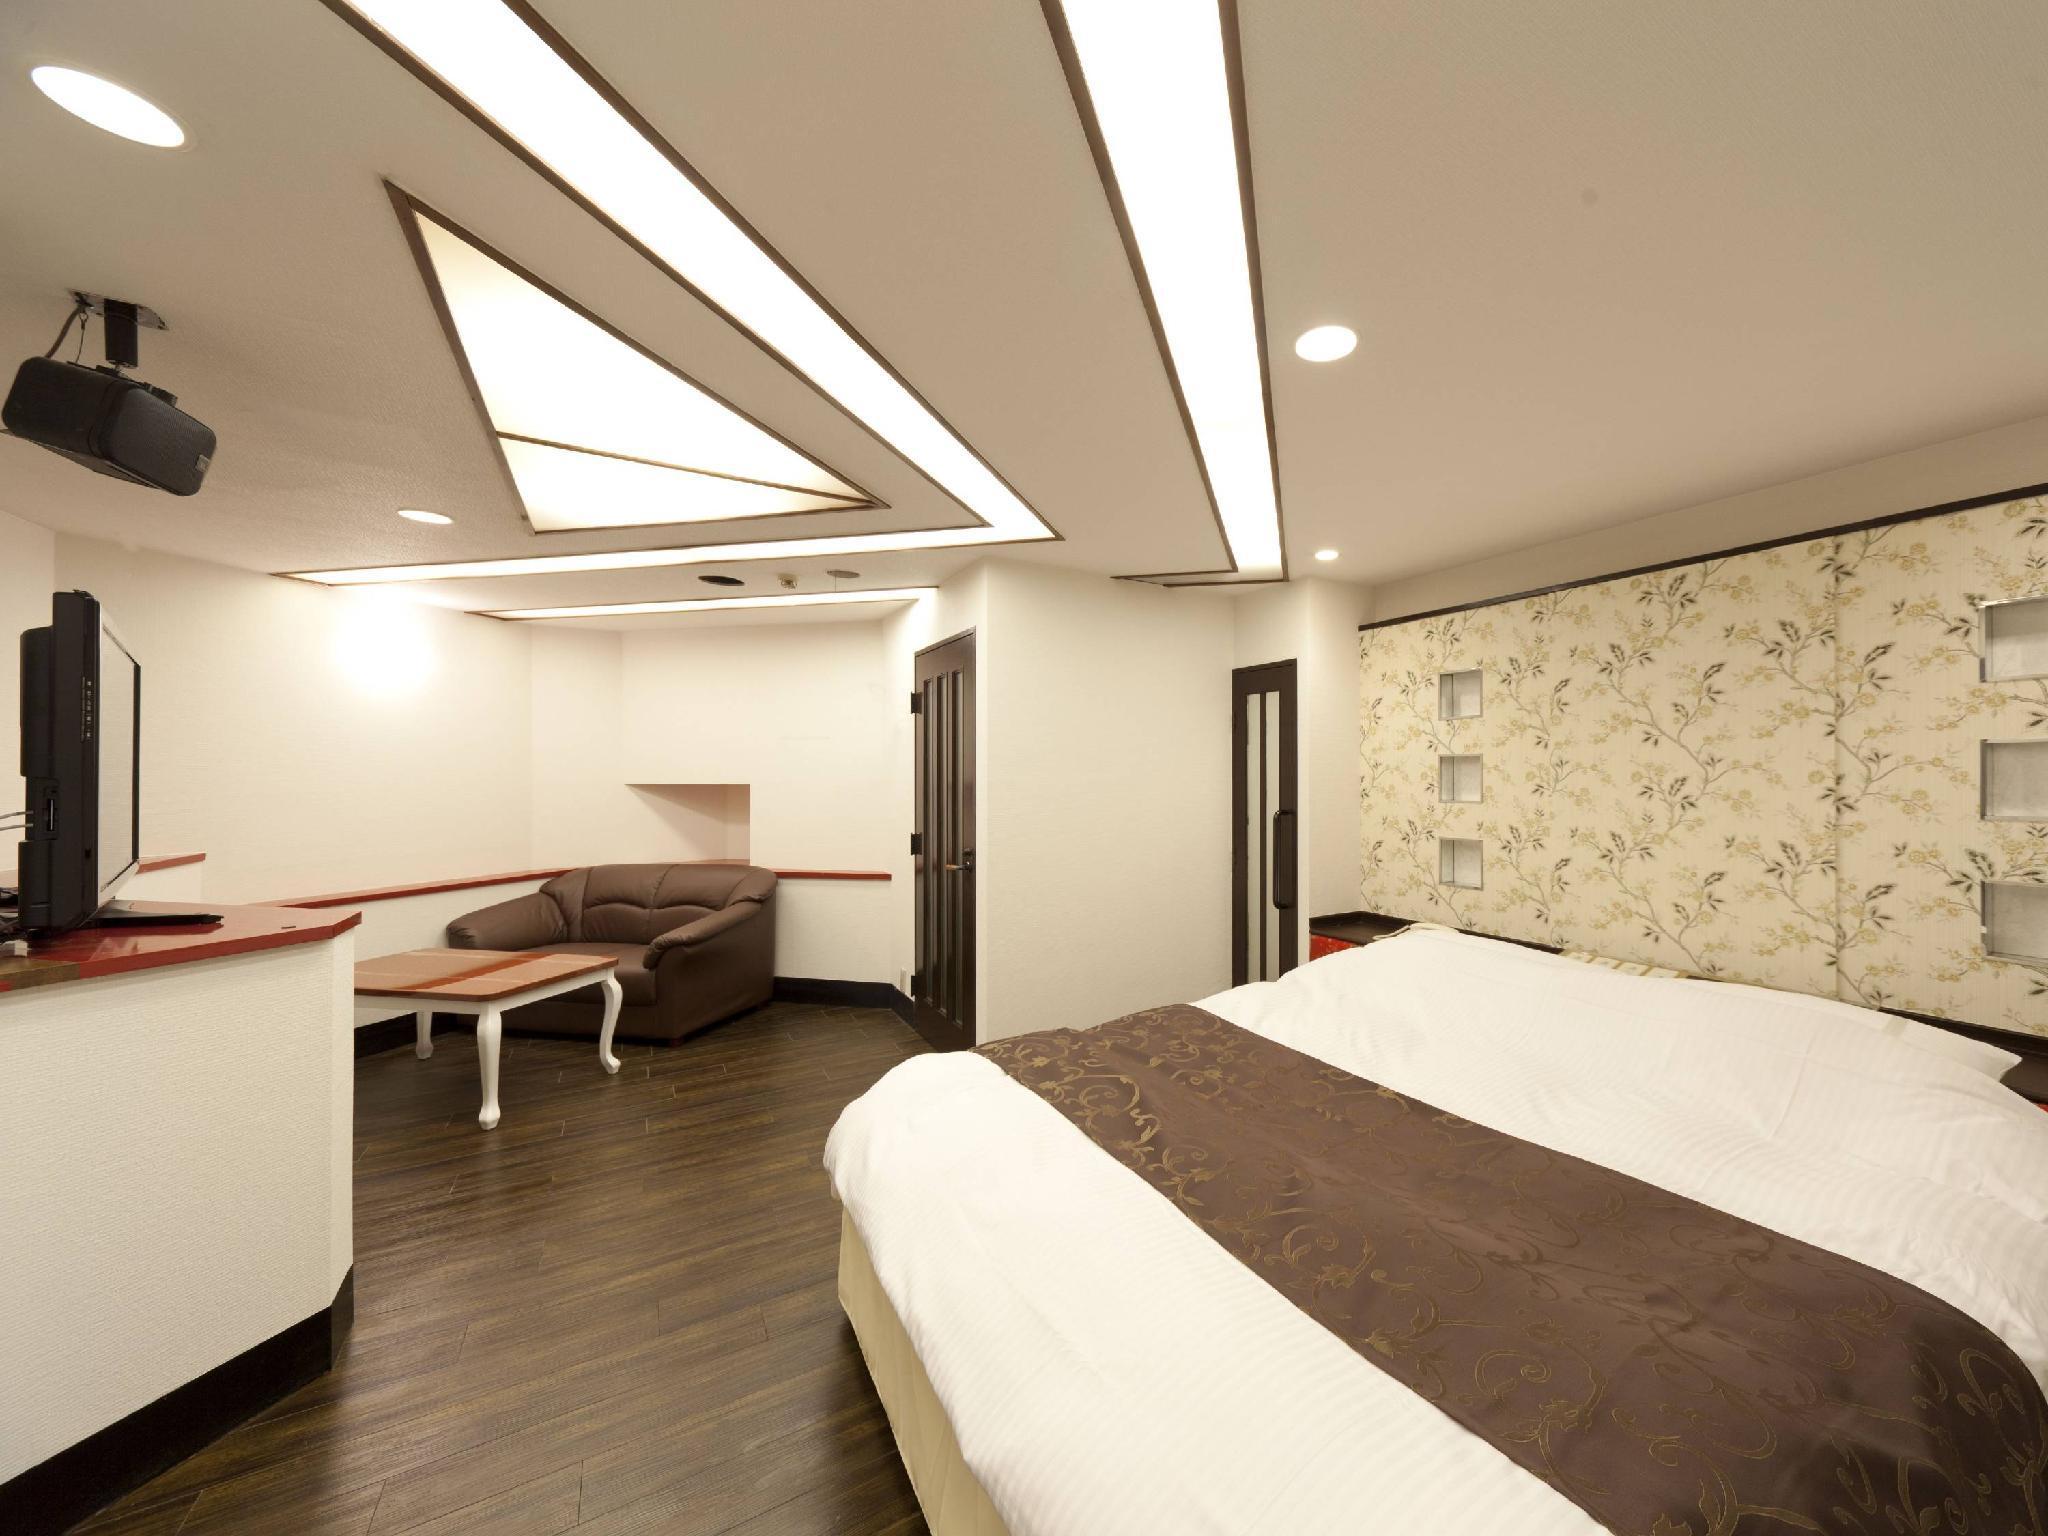 Hotel Fine Garden Okayama 1 Free Parking - Adult Only, Okayama